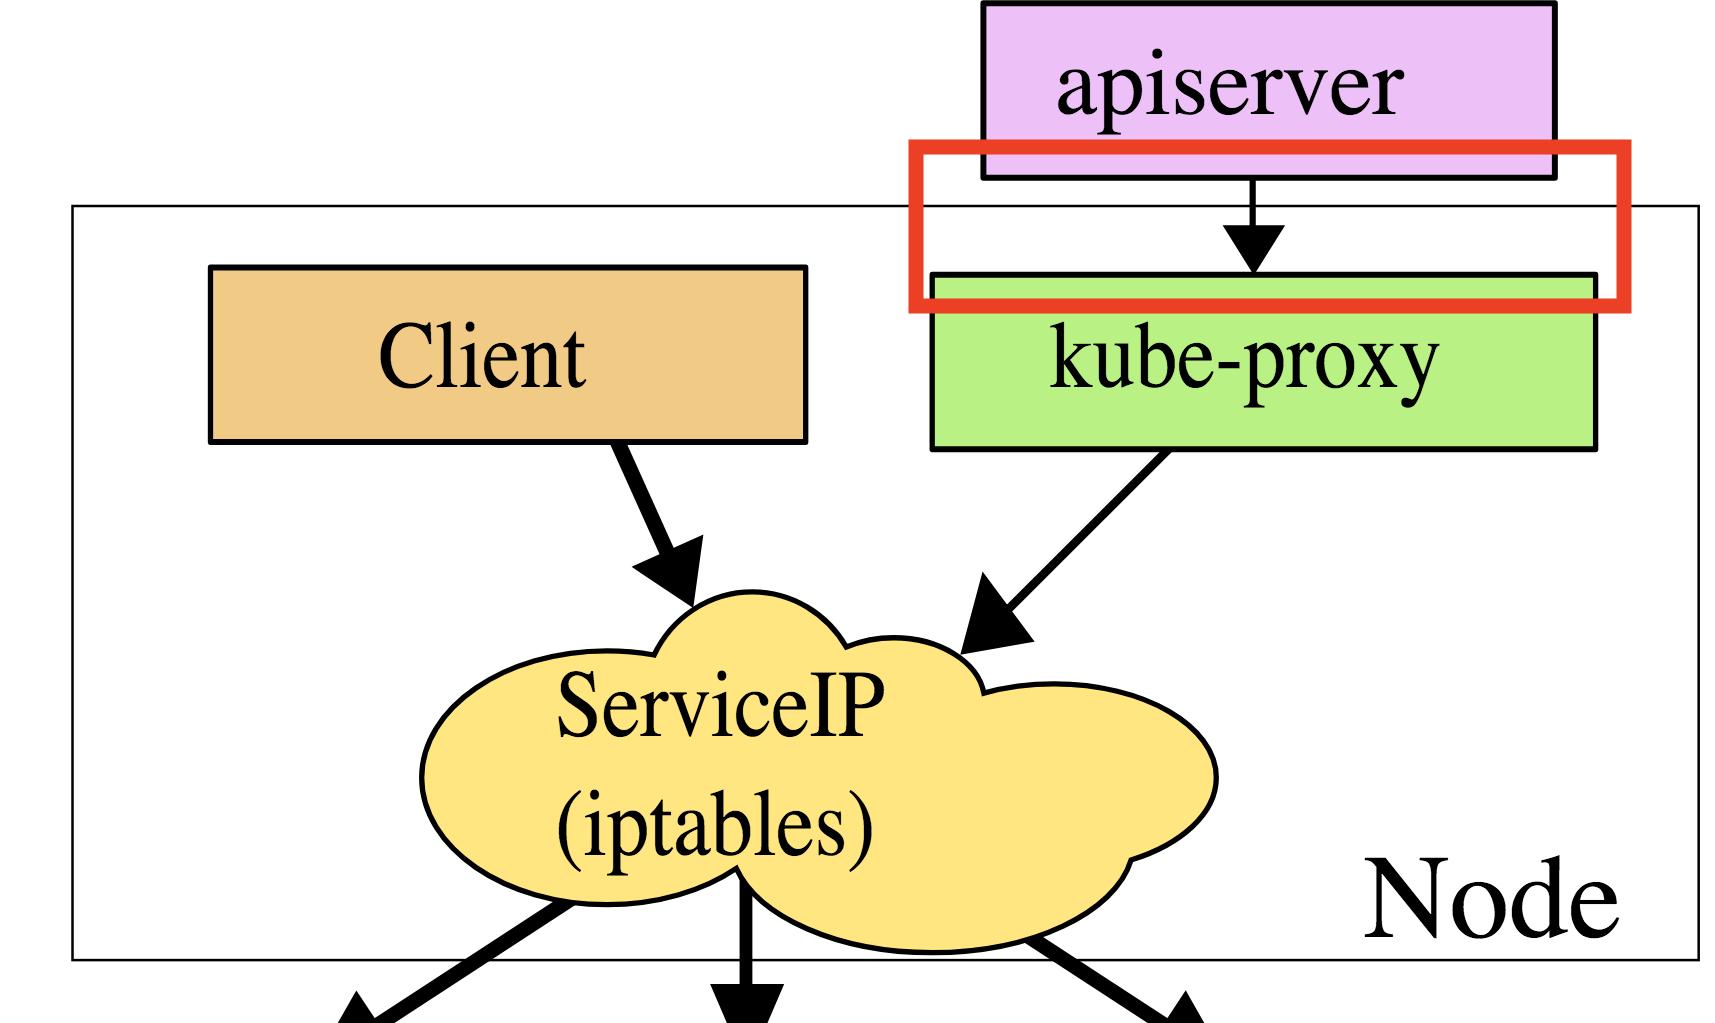 apiserver-access-nodes